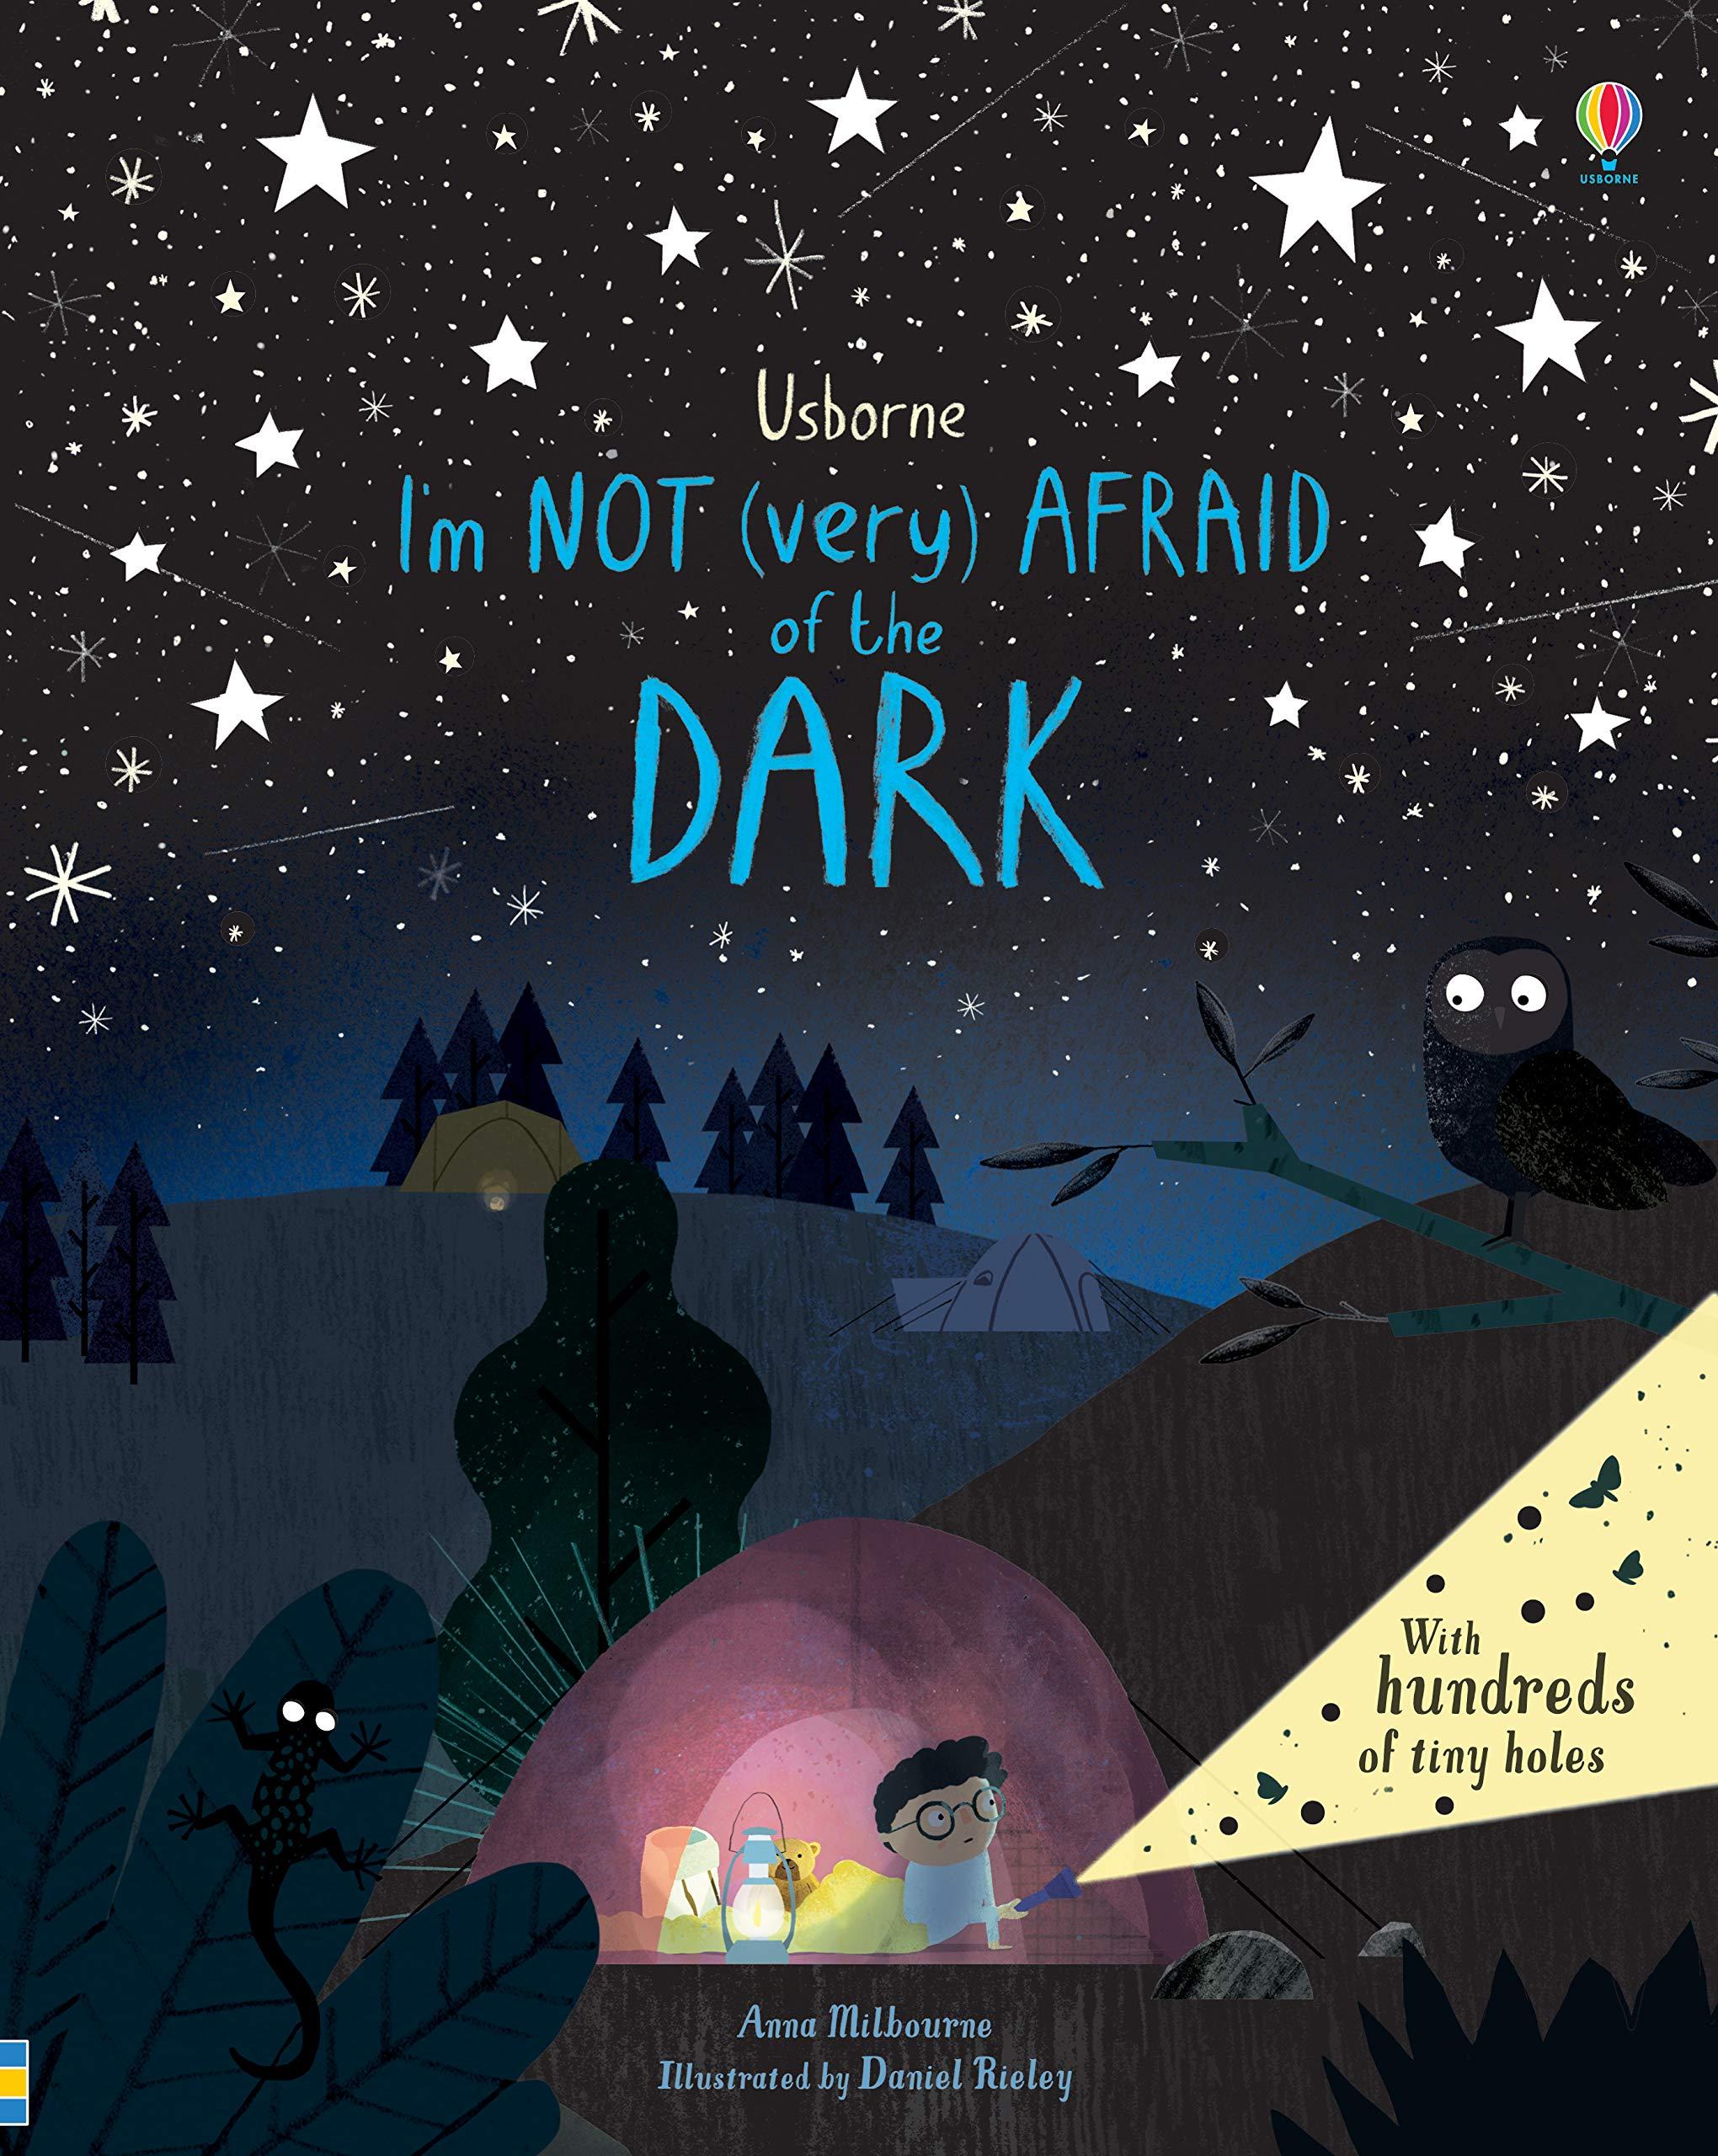 I'm Not (Very) Afraid of the Dark: Amazon.co.uk: Anna Milbourne, Daniel  Rieley, Daniel Rieley: 9781474940726: Books